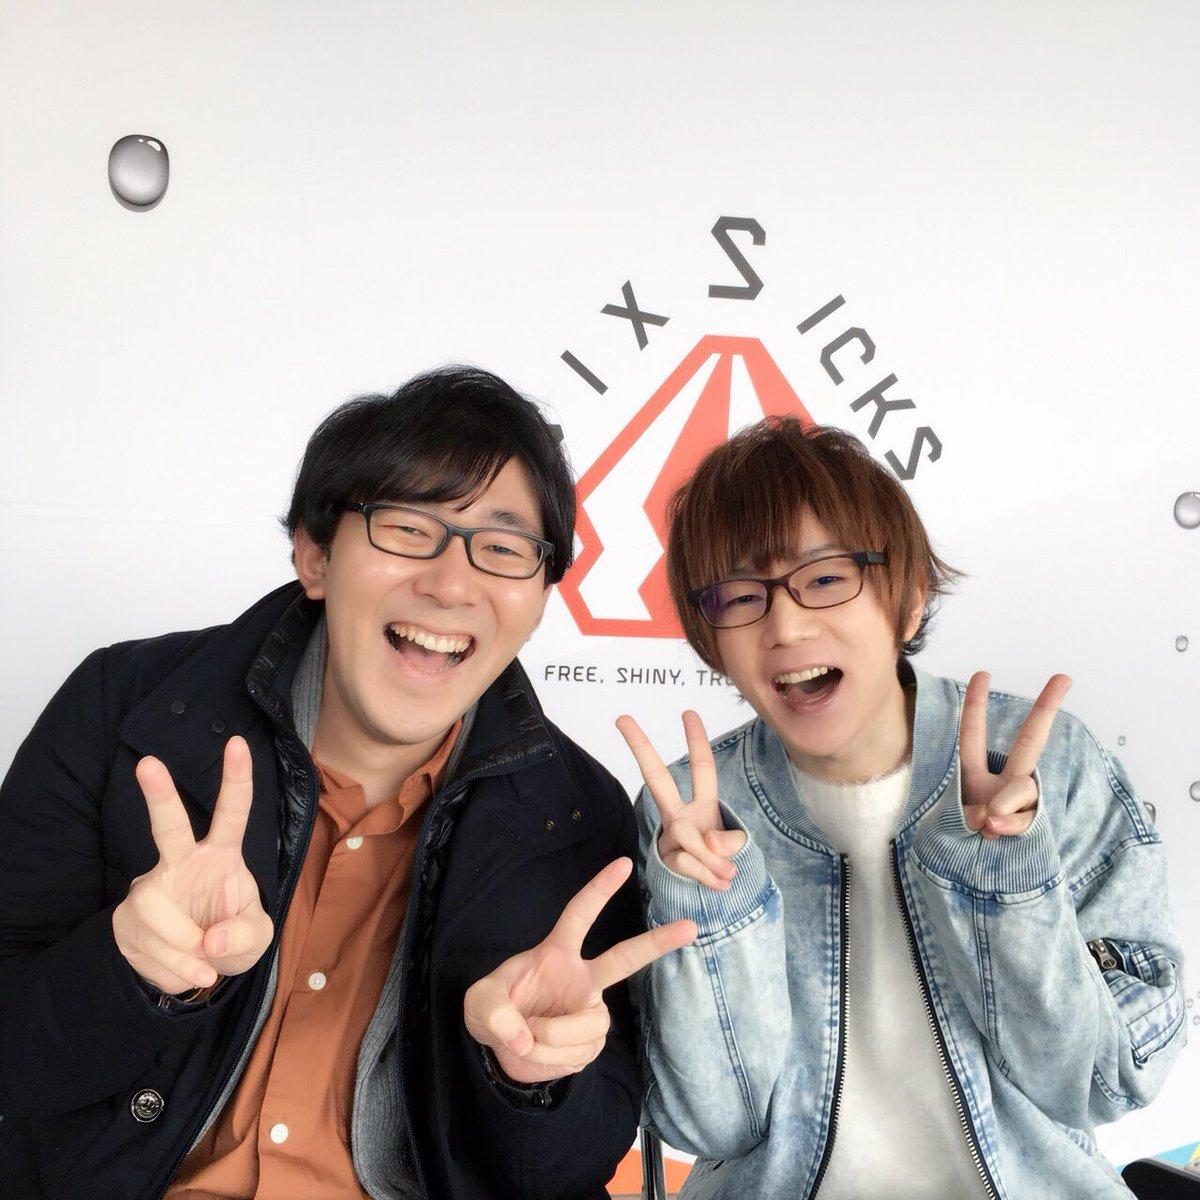 sixsicks in福岡!! ありがとうございましたー!!  小野友樹さんも小野賢章さんも村瀬歩さ…